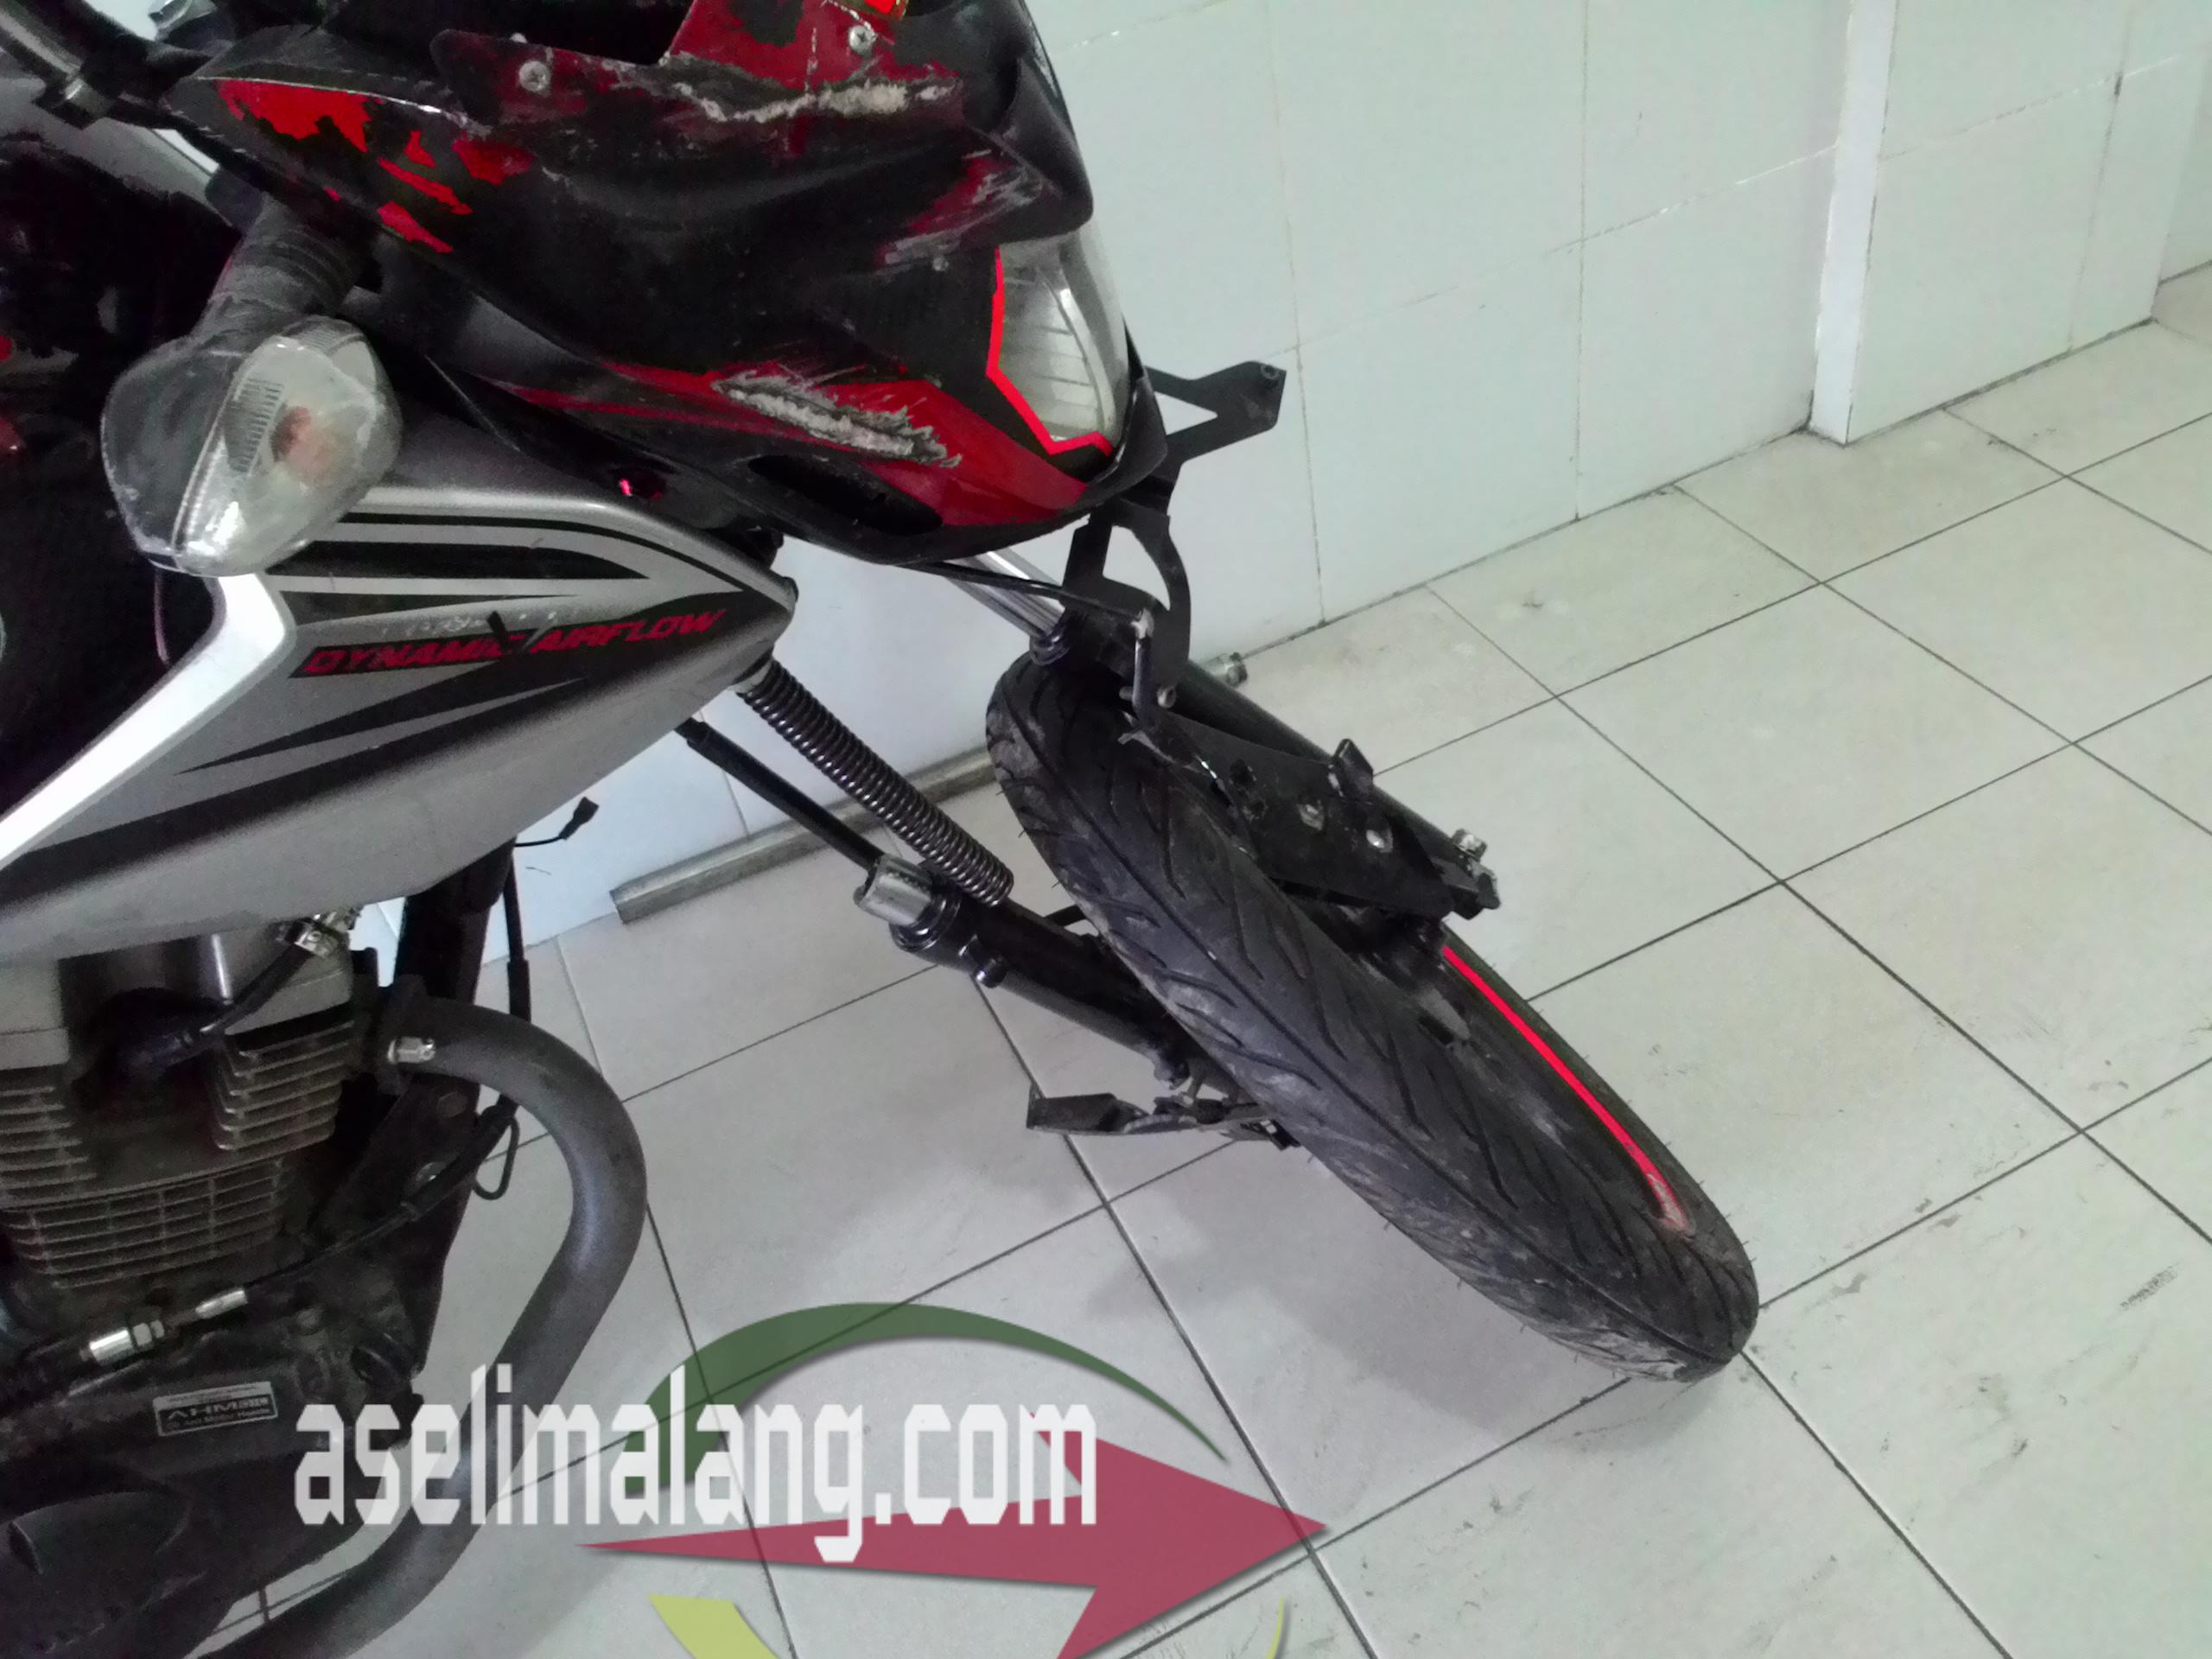 Honda Verza Sekedar Coretan 150 Cw Persa3